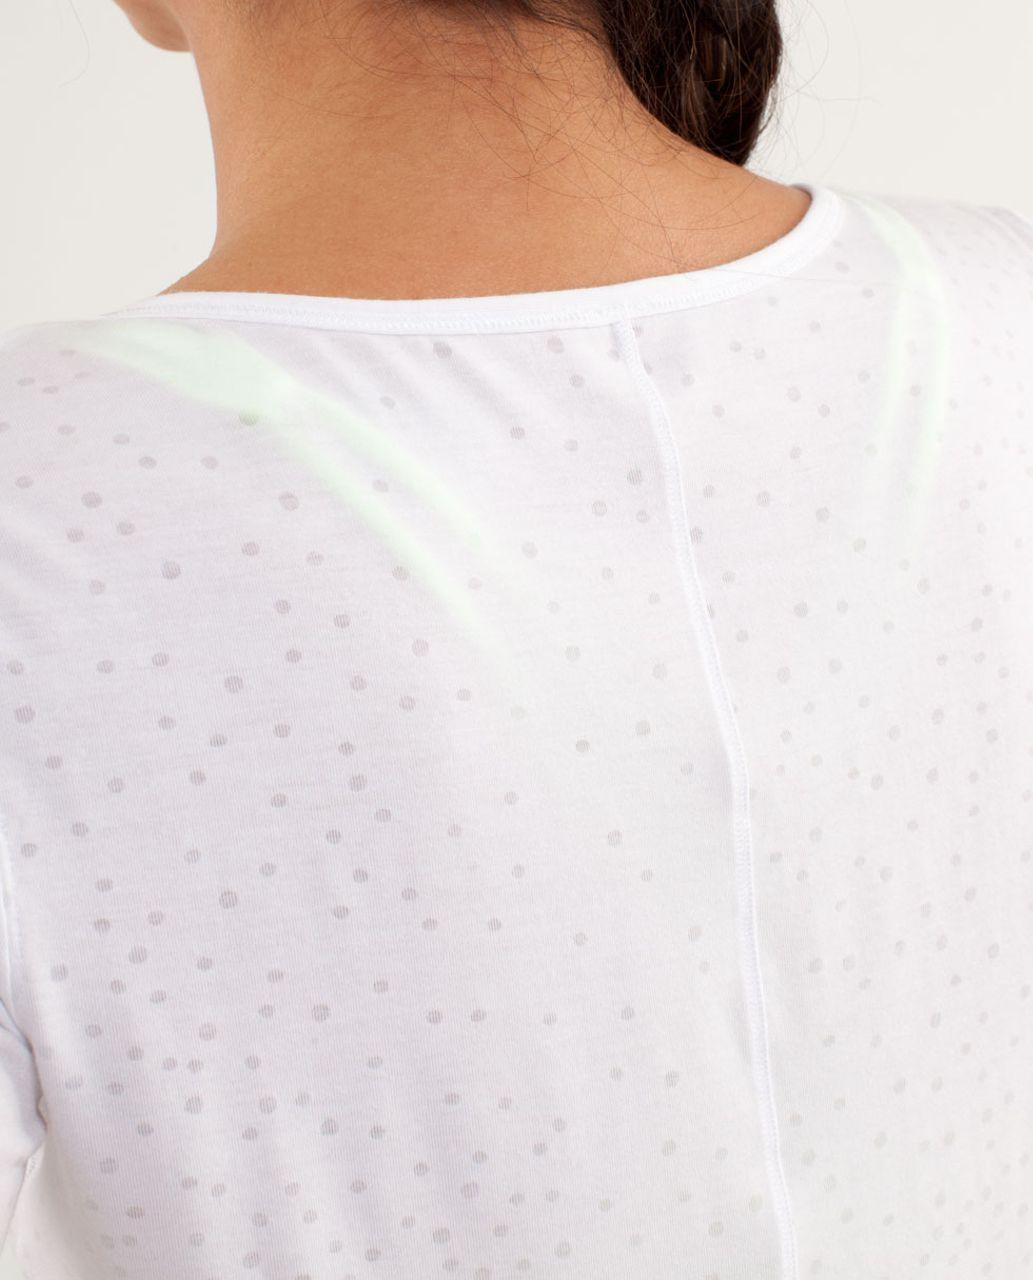 Lululemon Drish Tee - Petit Dot White / White